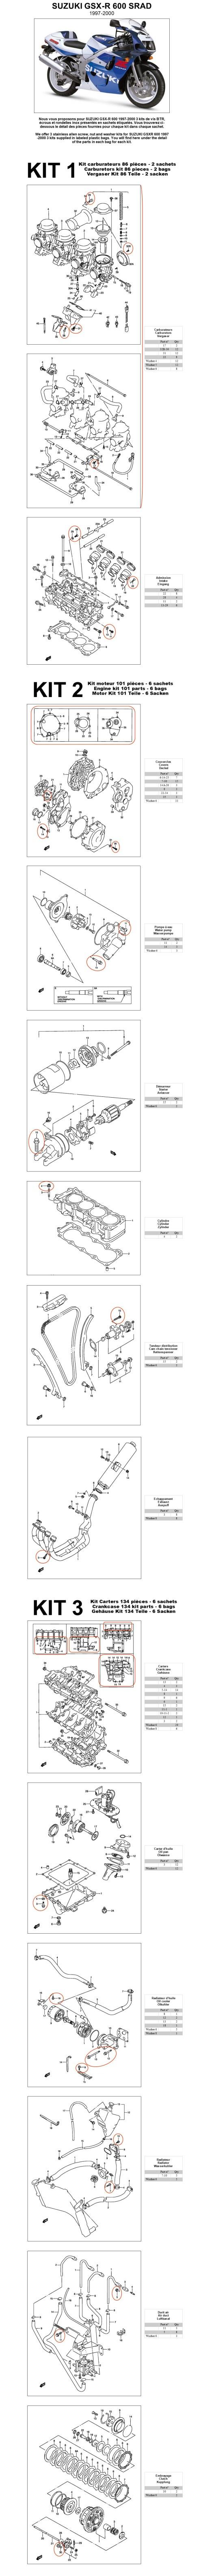 small resolution of srad gsxr 600 wiring diagram 1997